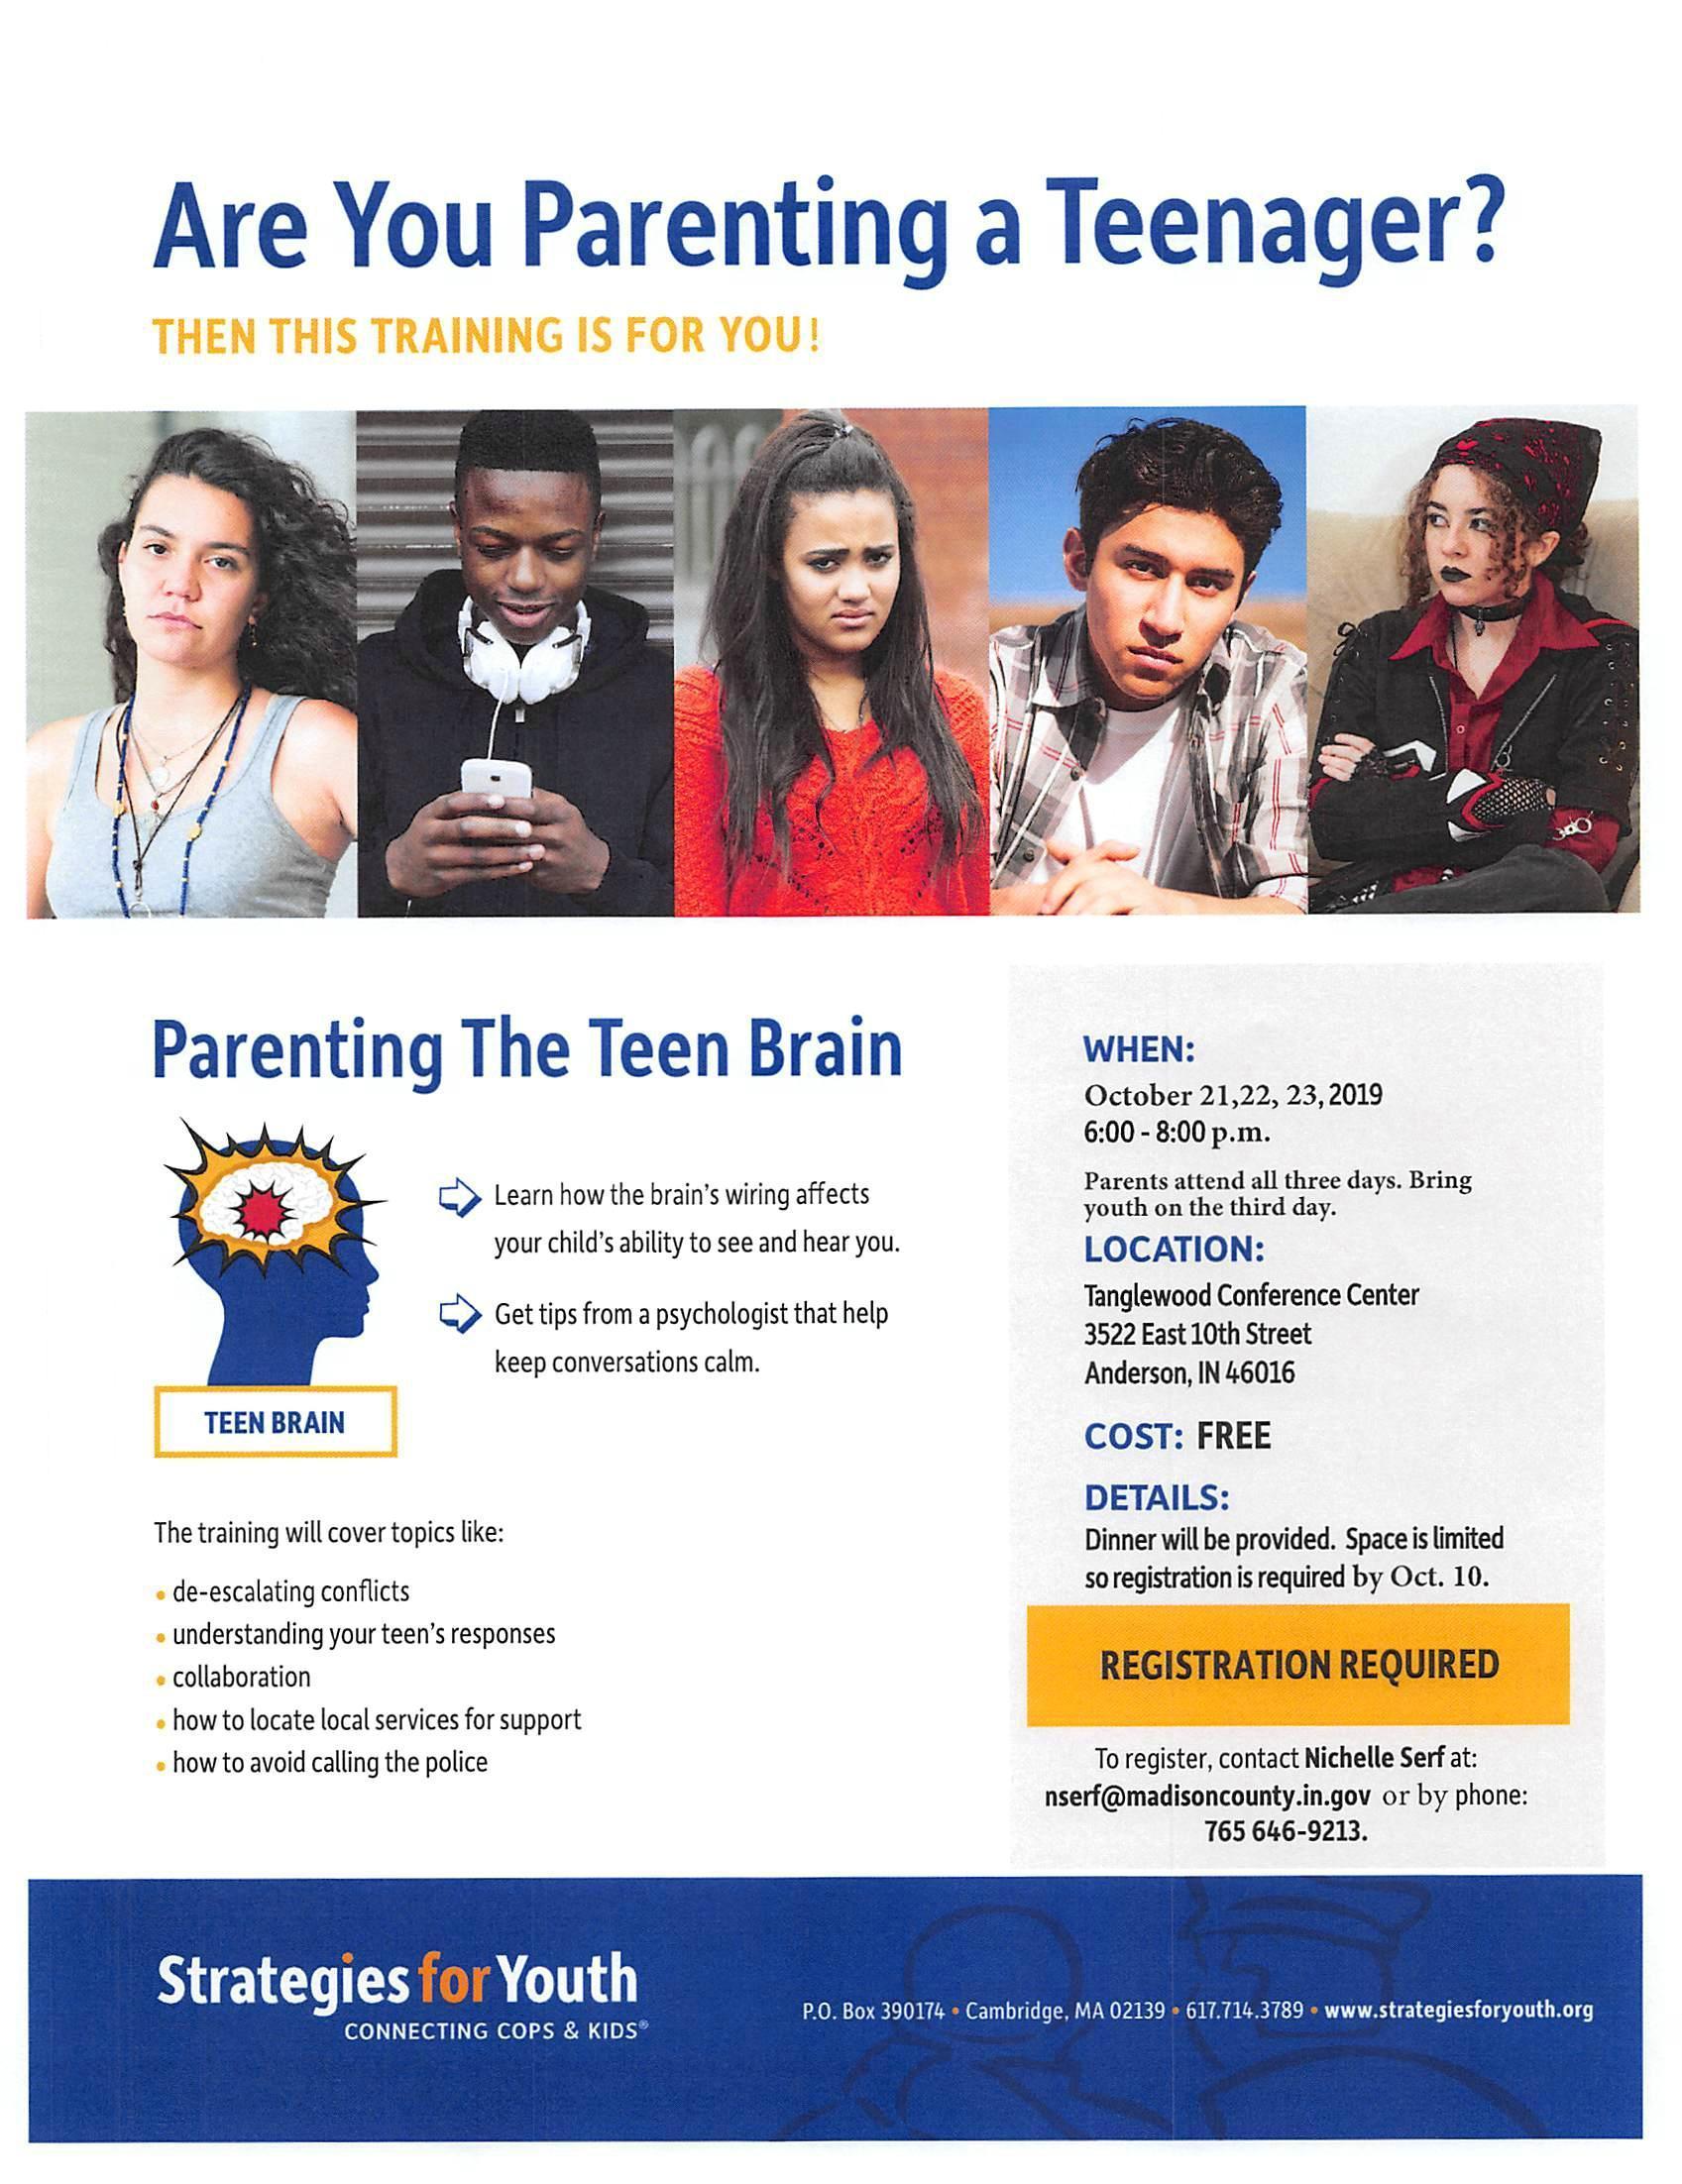 flyer for Parent the Teen Brain workshop, 10/21-23/2019